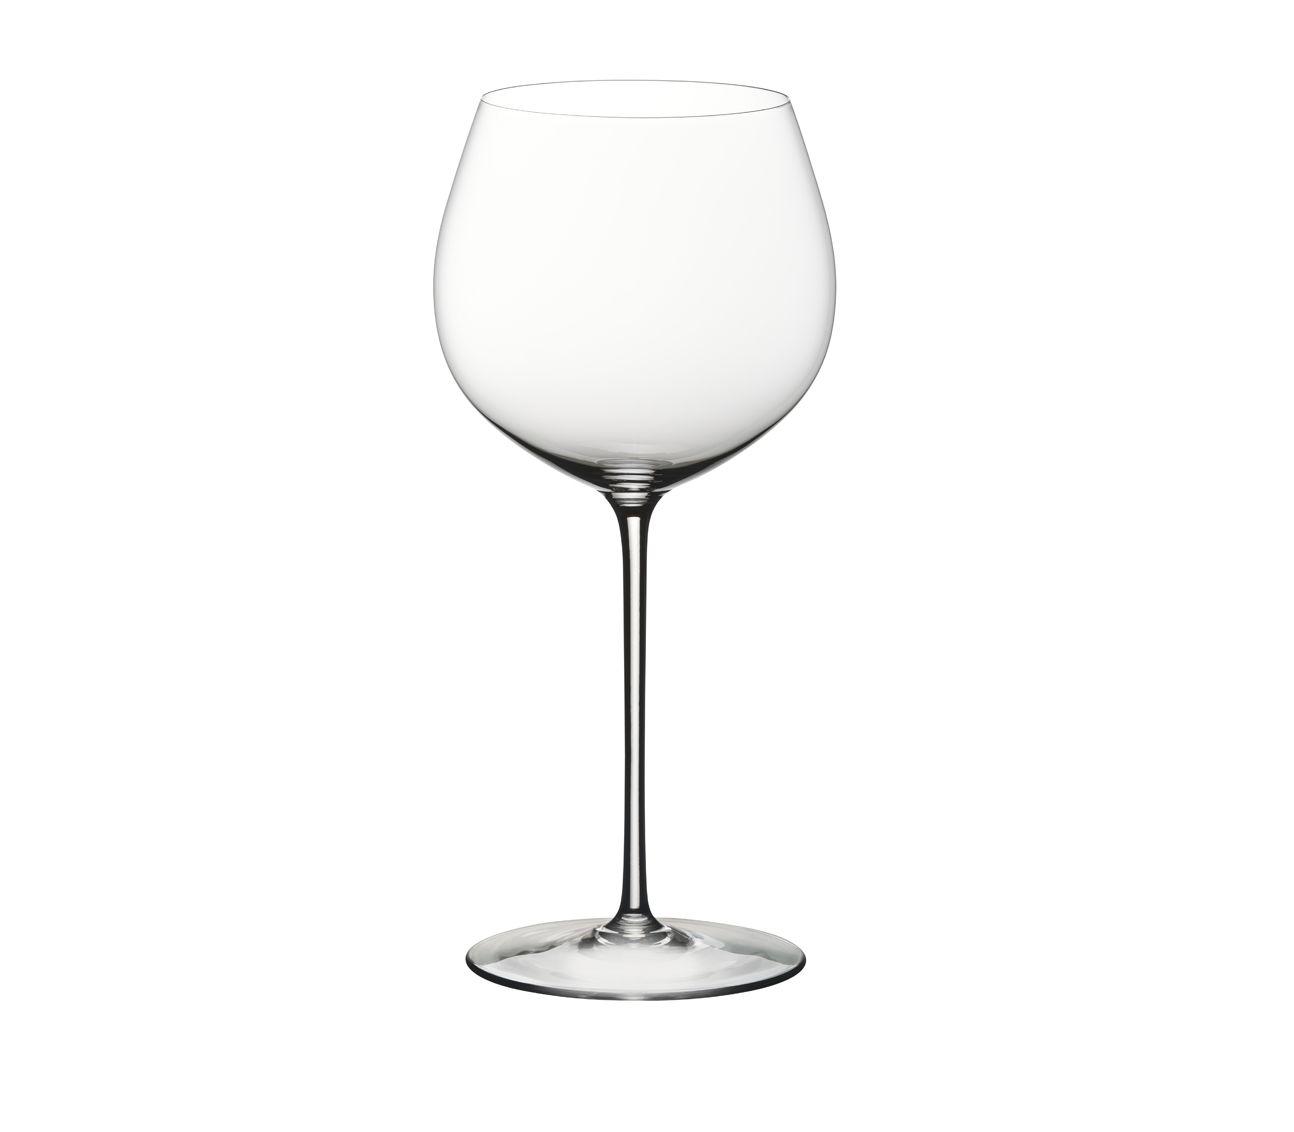 Онлайн каталог PROMENU: Бокал для белого вина OAKED CHARDONNAY Riedel SUPERLEGGERO, объем 0,765 л, прозрачный                               4425/97